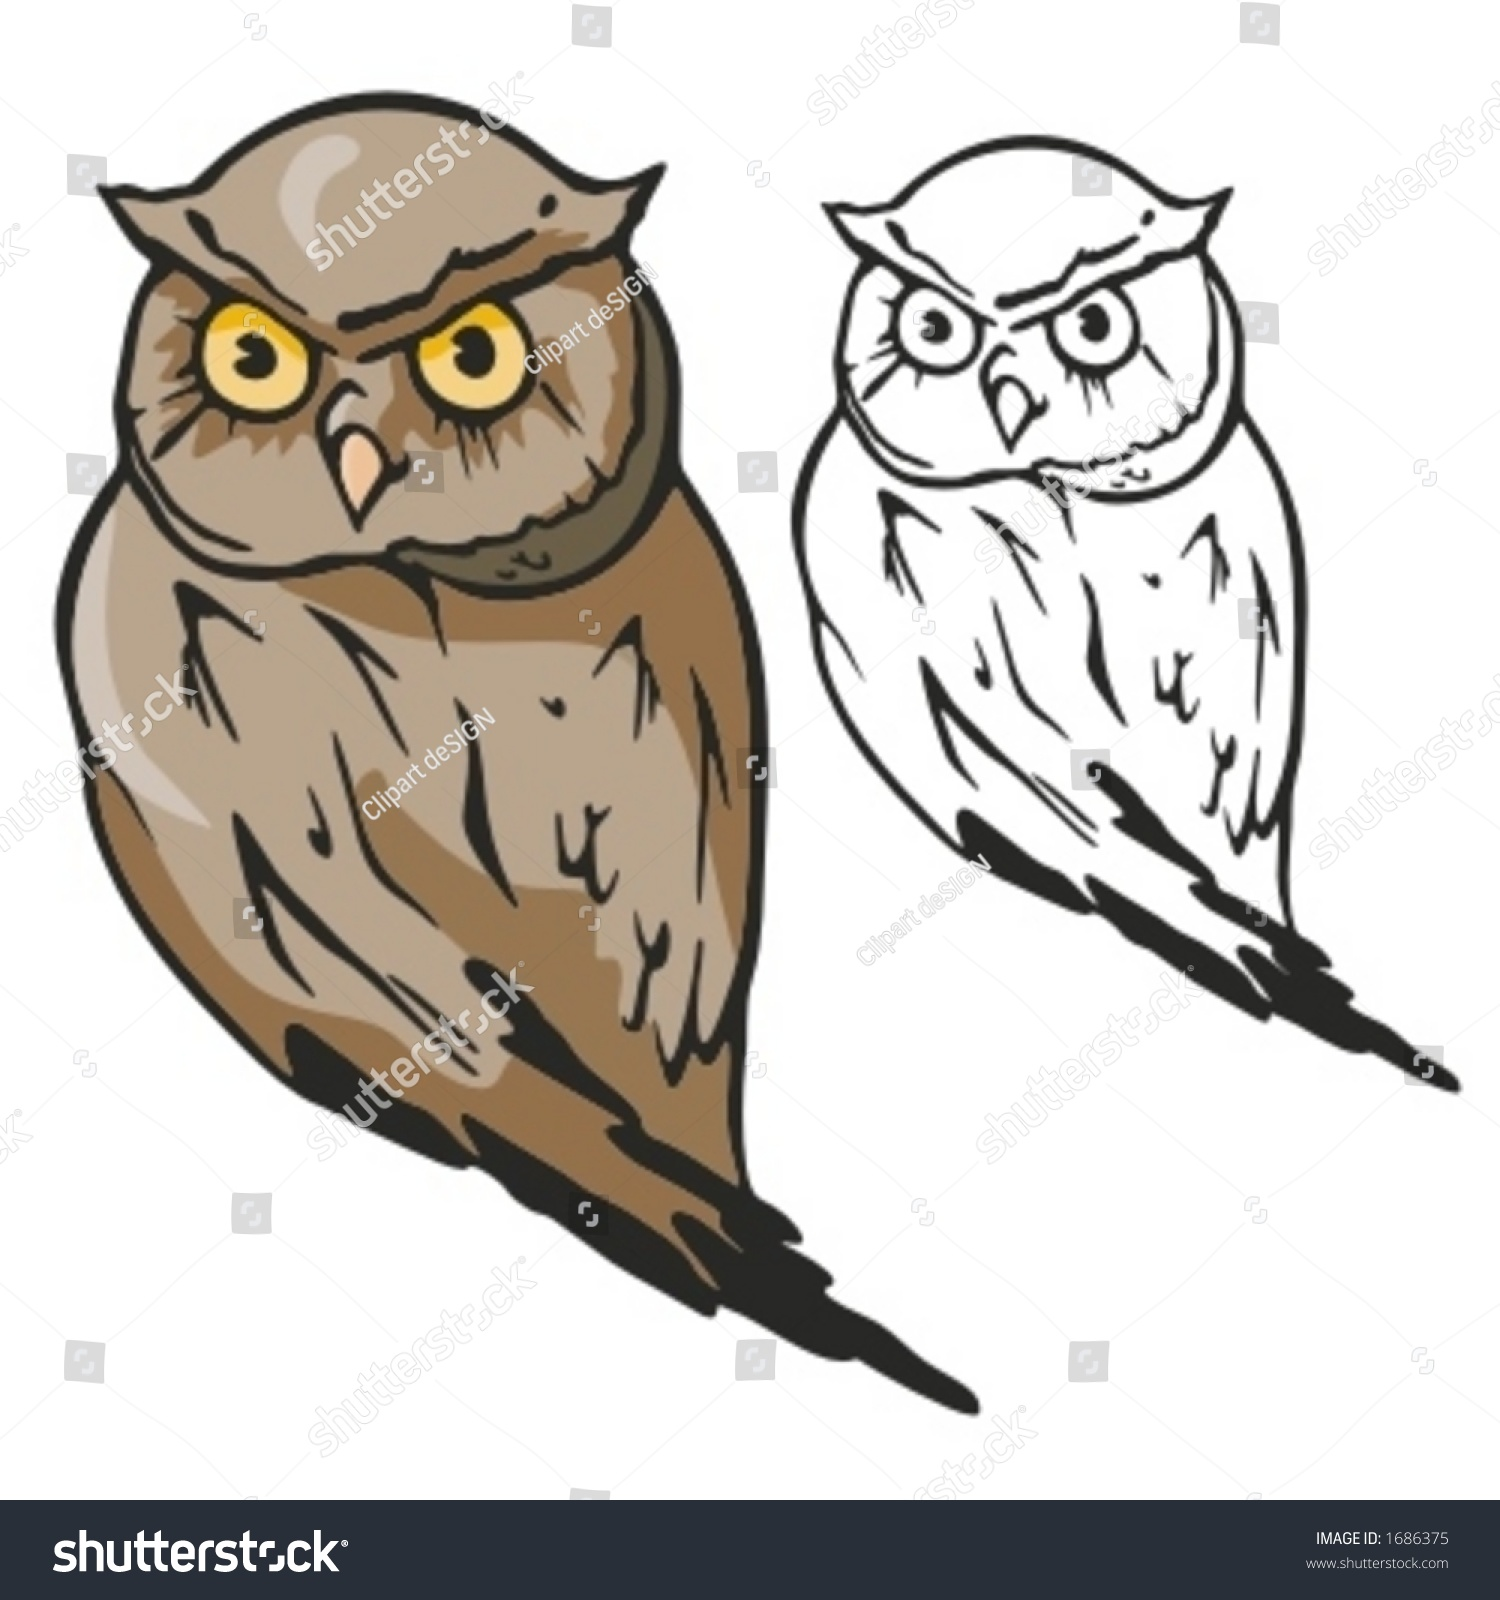 Owl Mascot Sport Teams Great Tshirt Stock Vector 1686375 ...